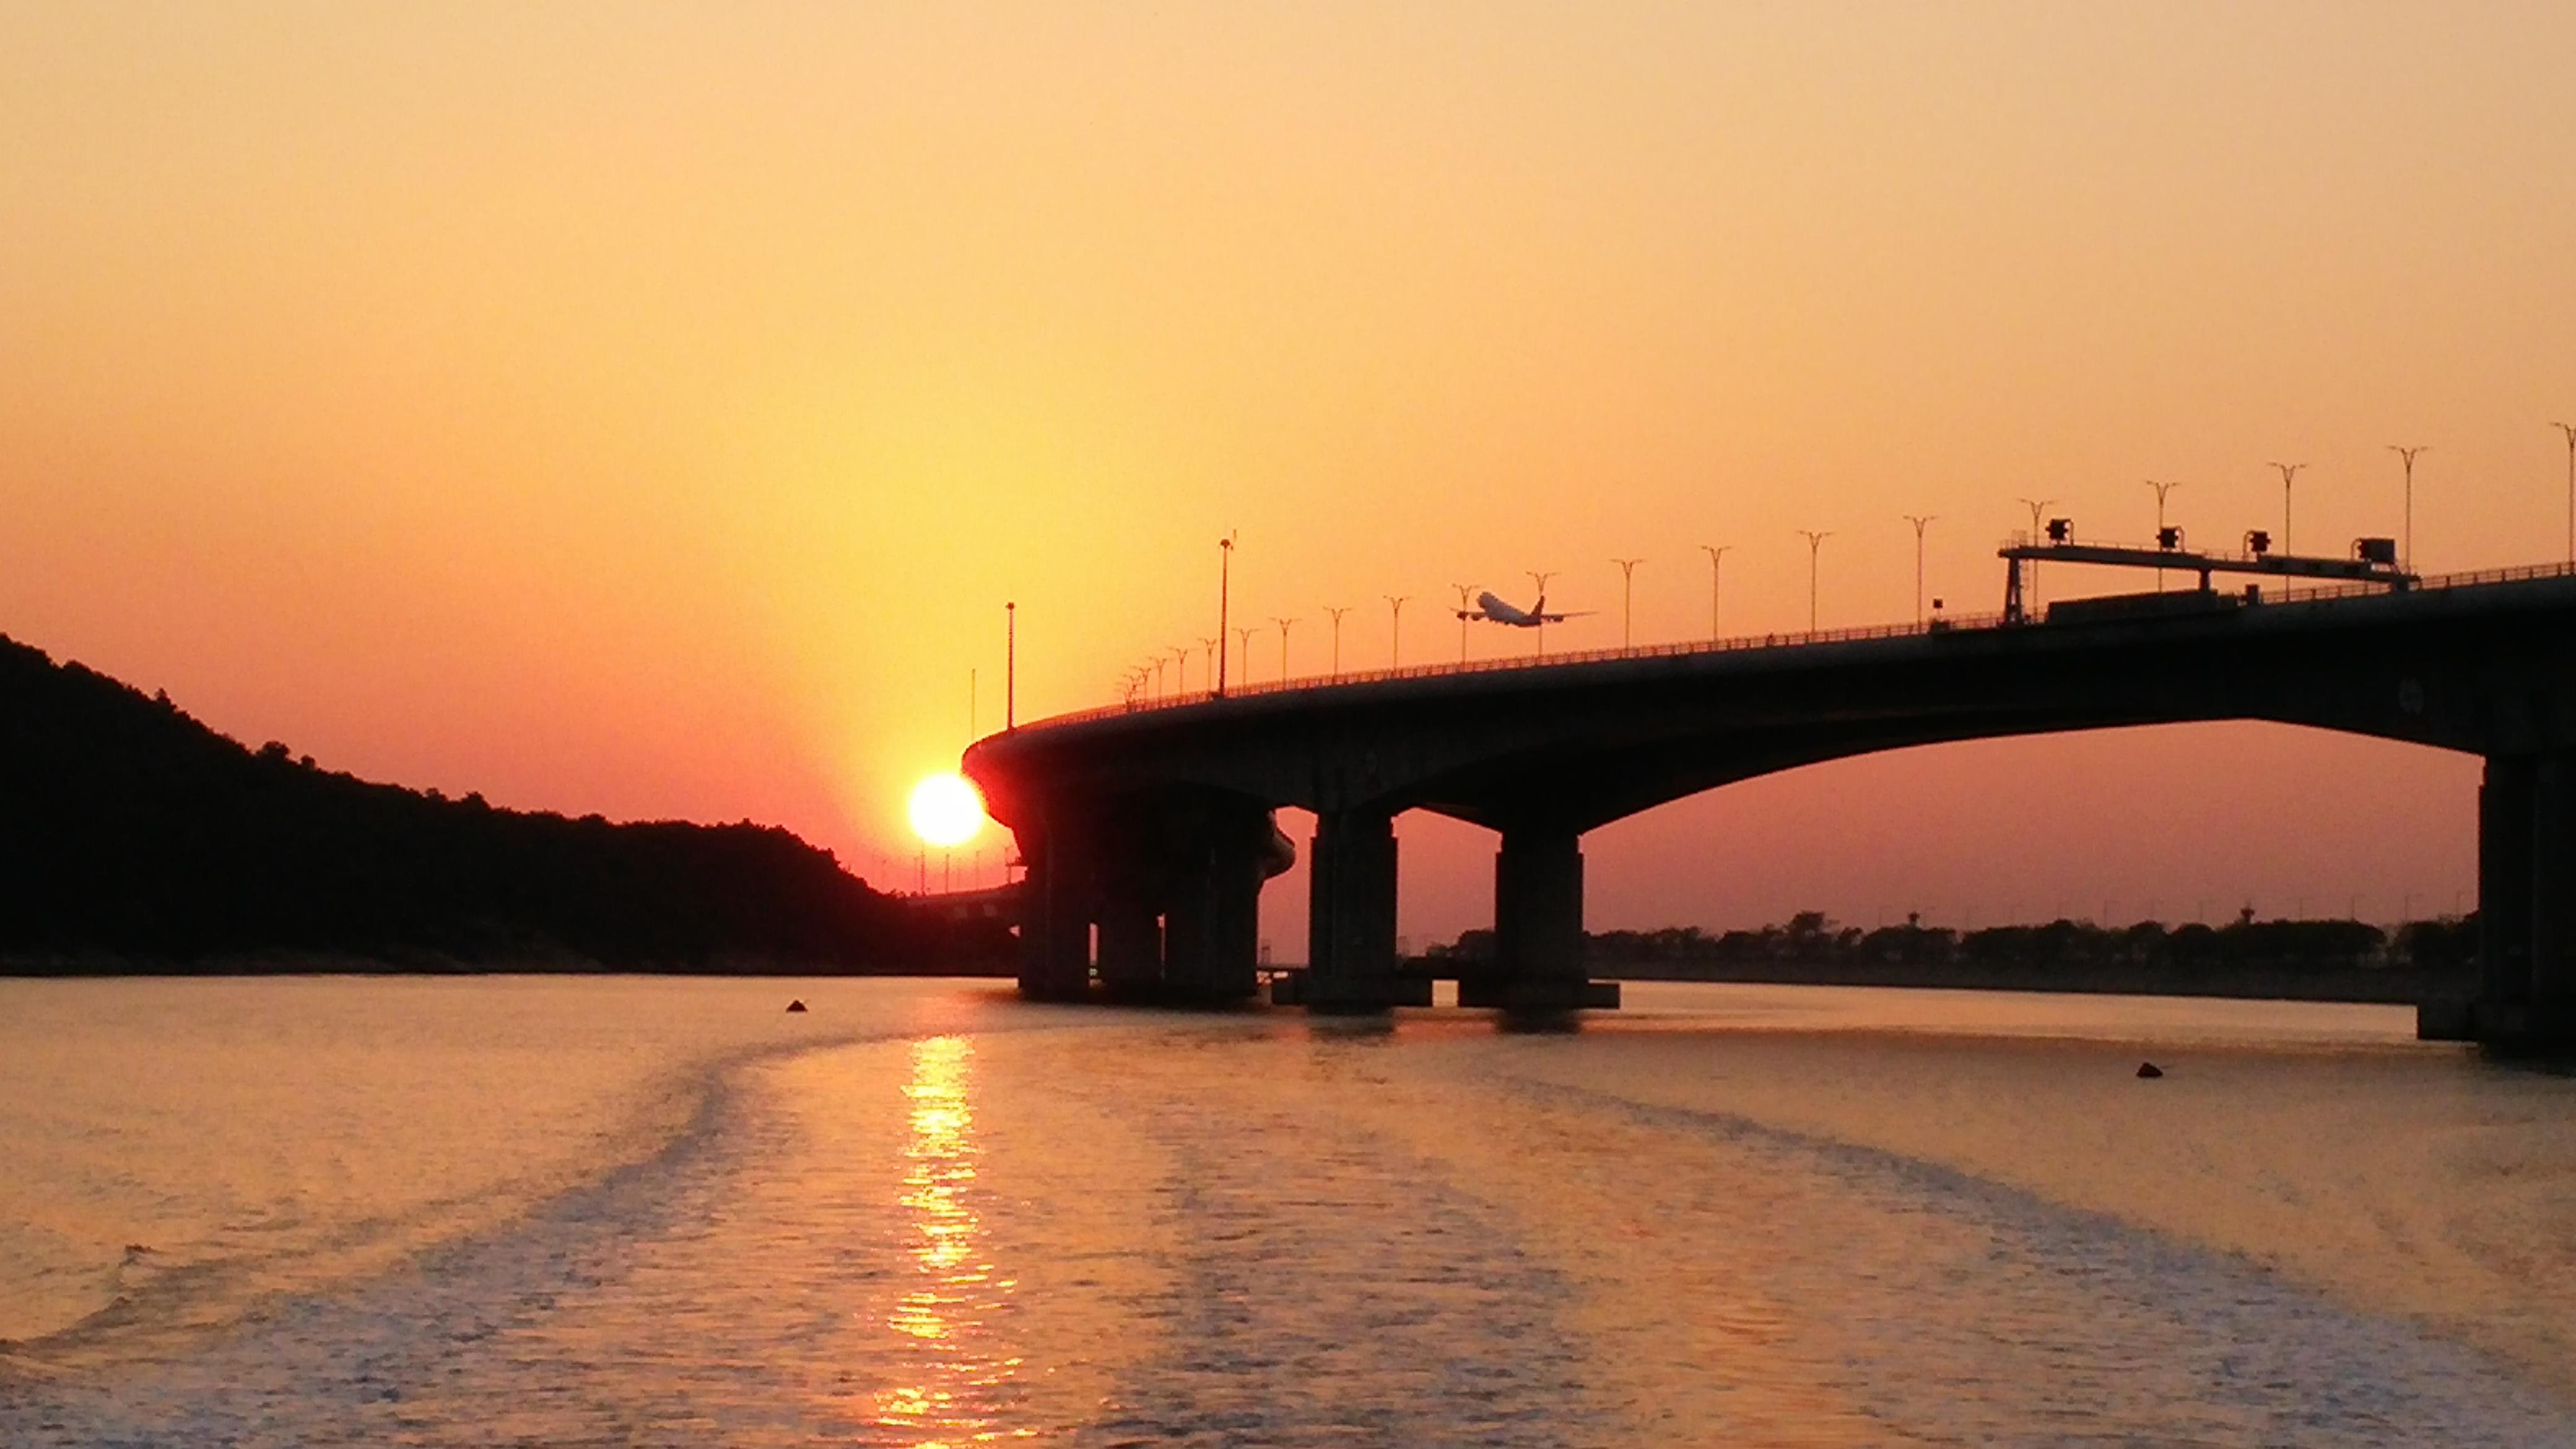 See Hong Kong Macau Zhuhai Bridge, sunset and flight takes off during Tai O to Tung Chung Ferry ride